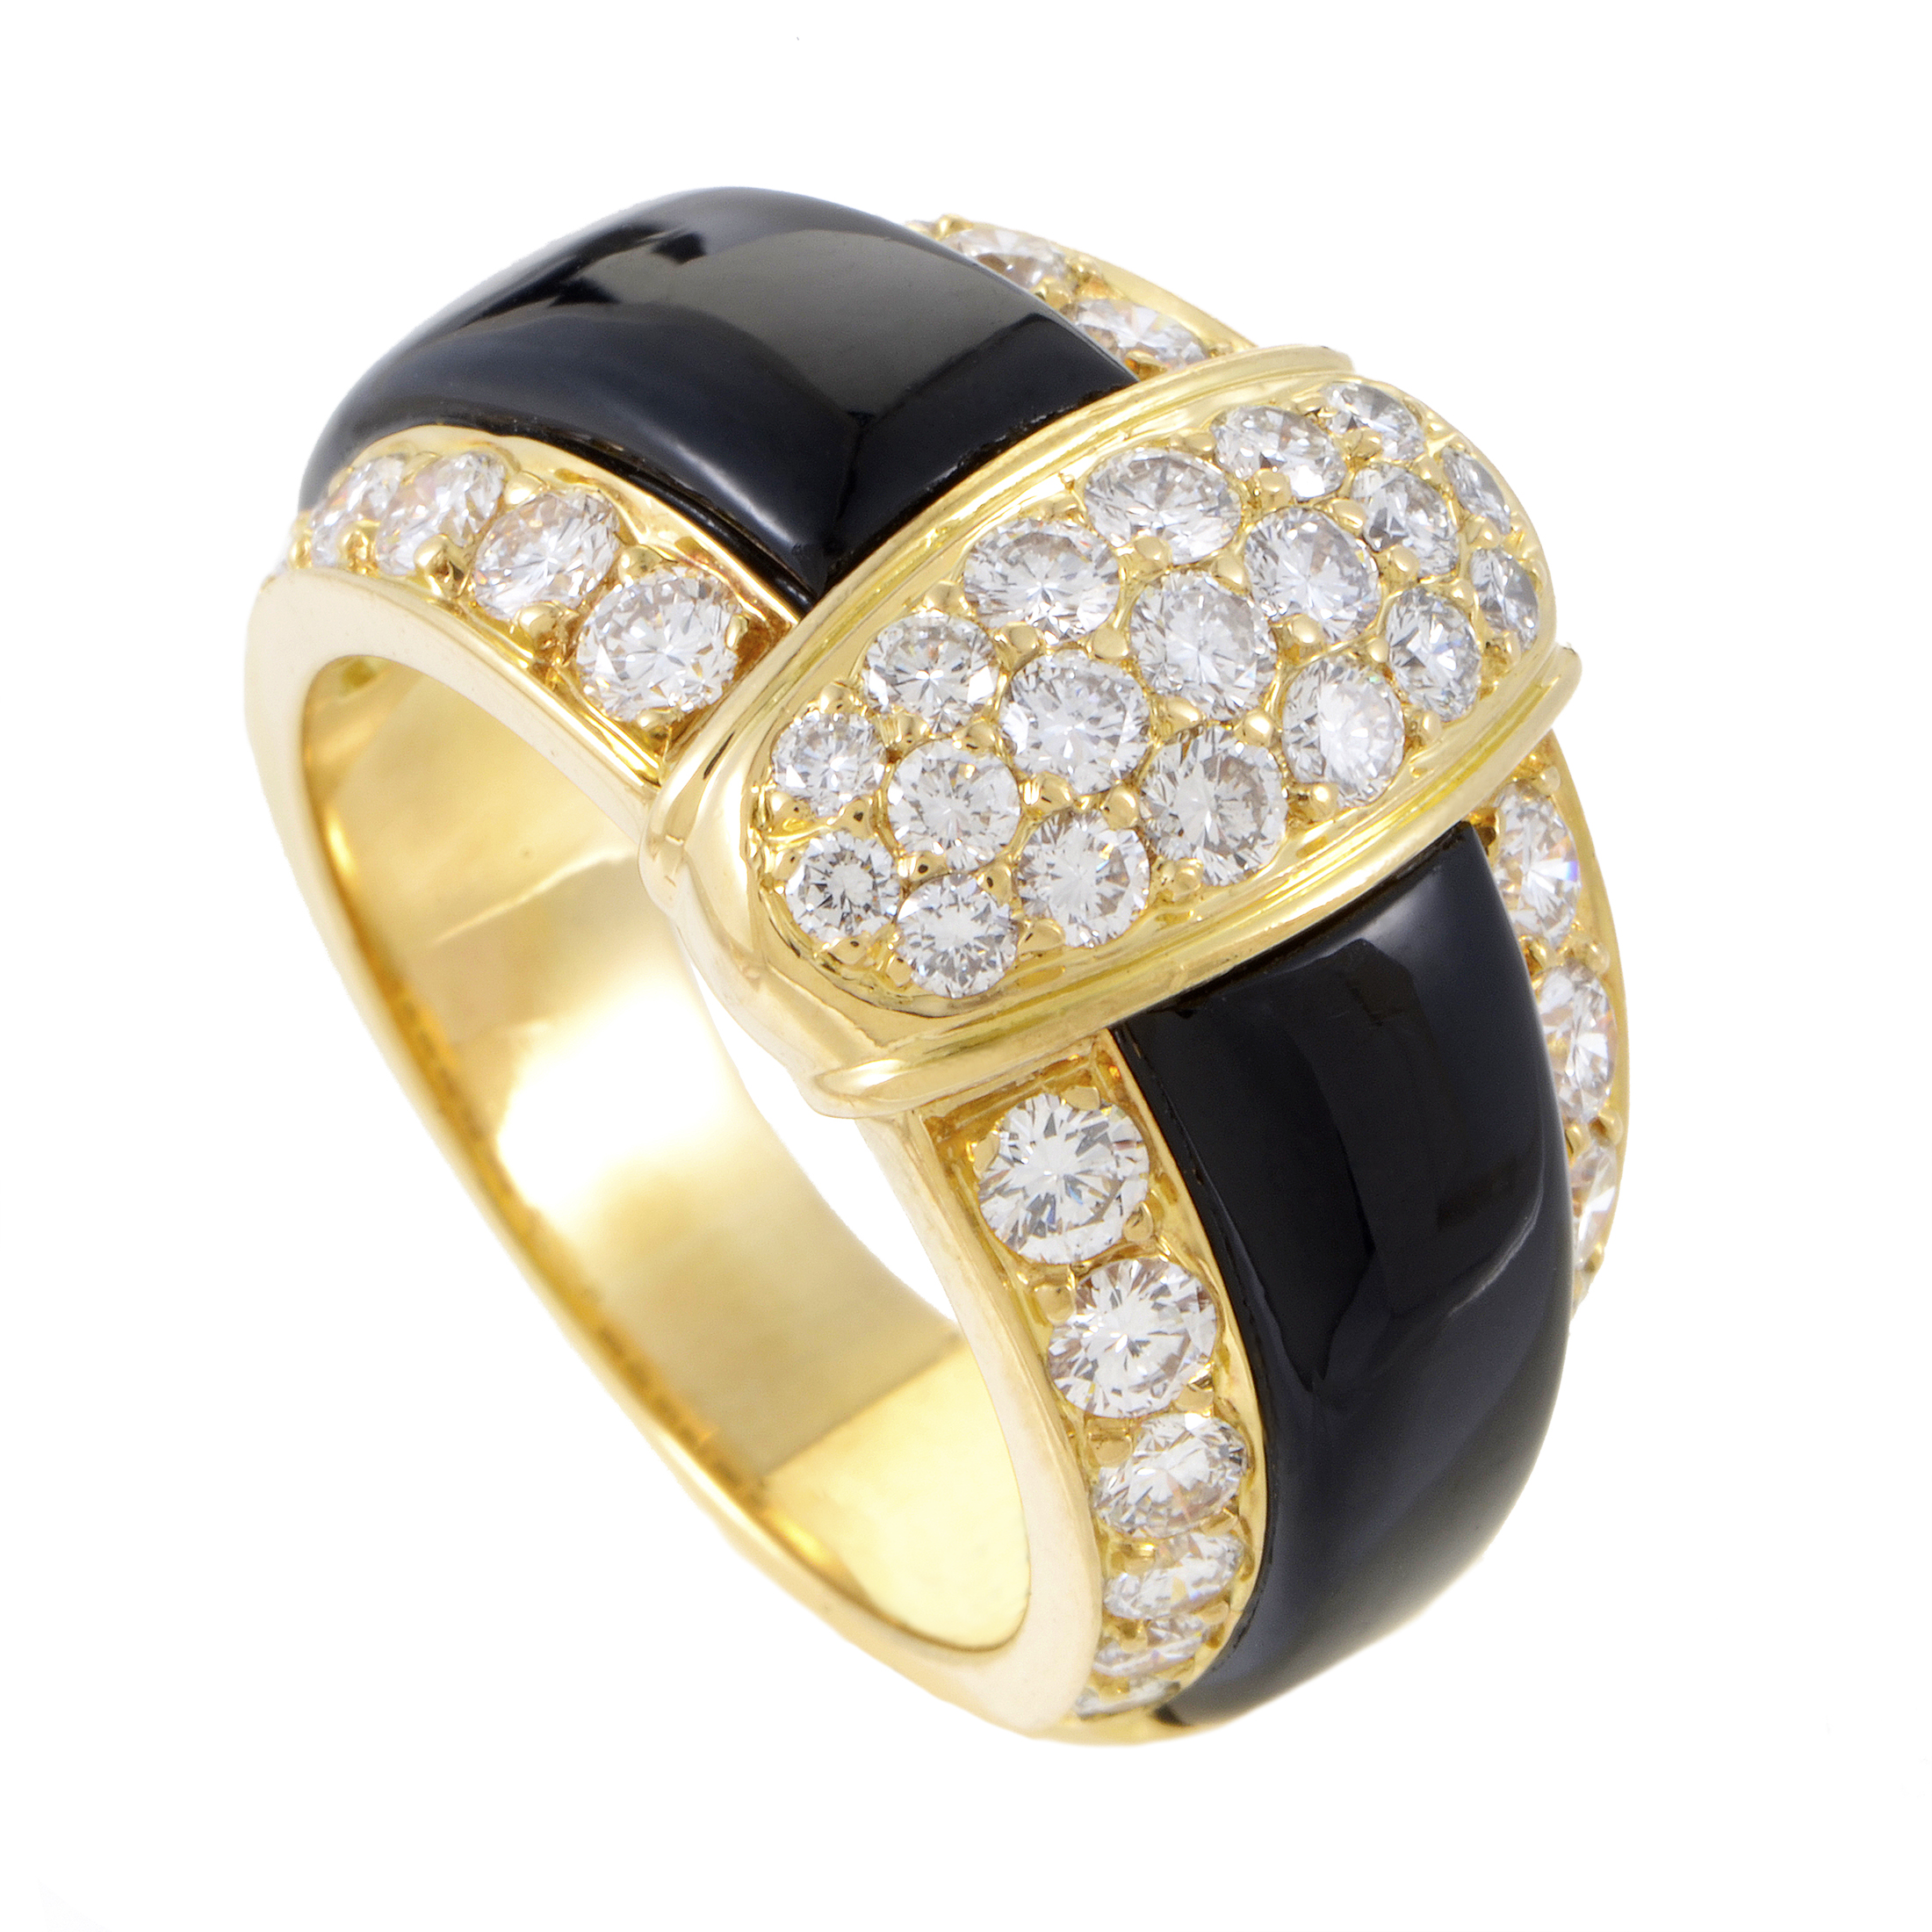 Van Cleef & Arpels Women's 18K Yellow Gold Diamond & Onyx Band Ring